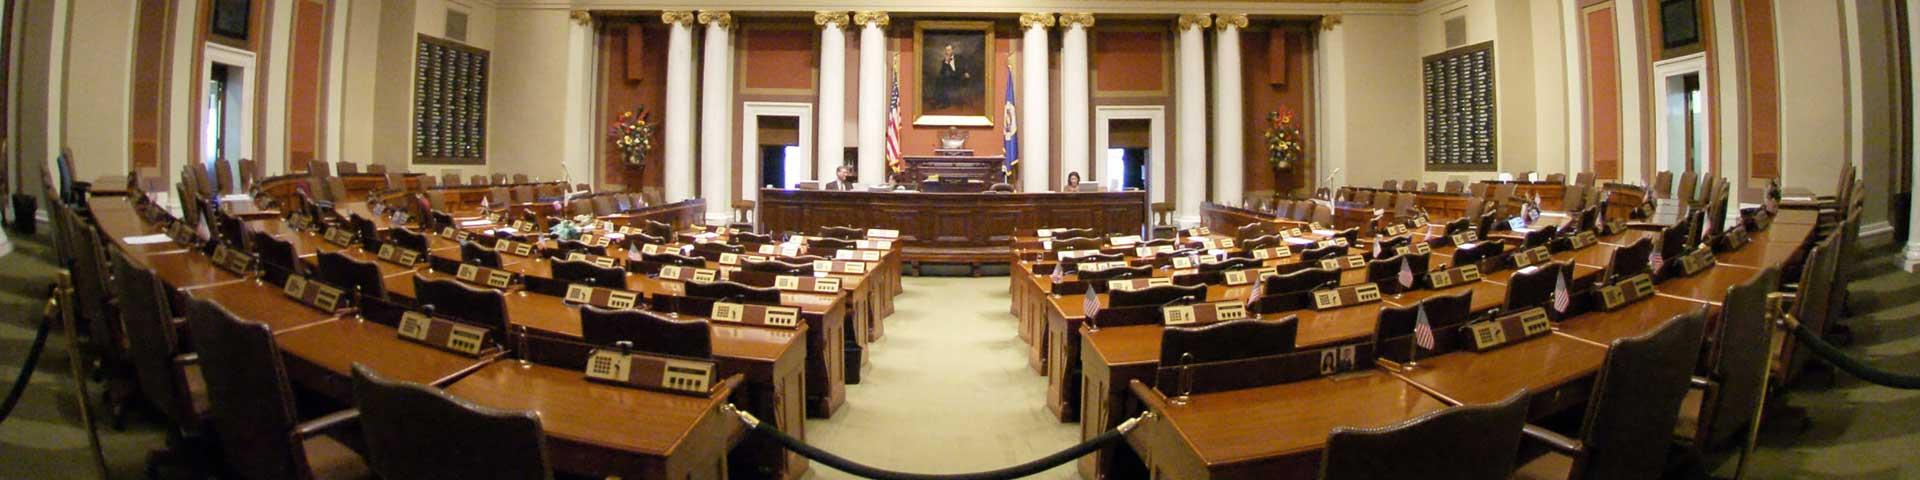 Minnesota House of Representatives chamber